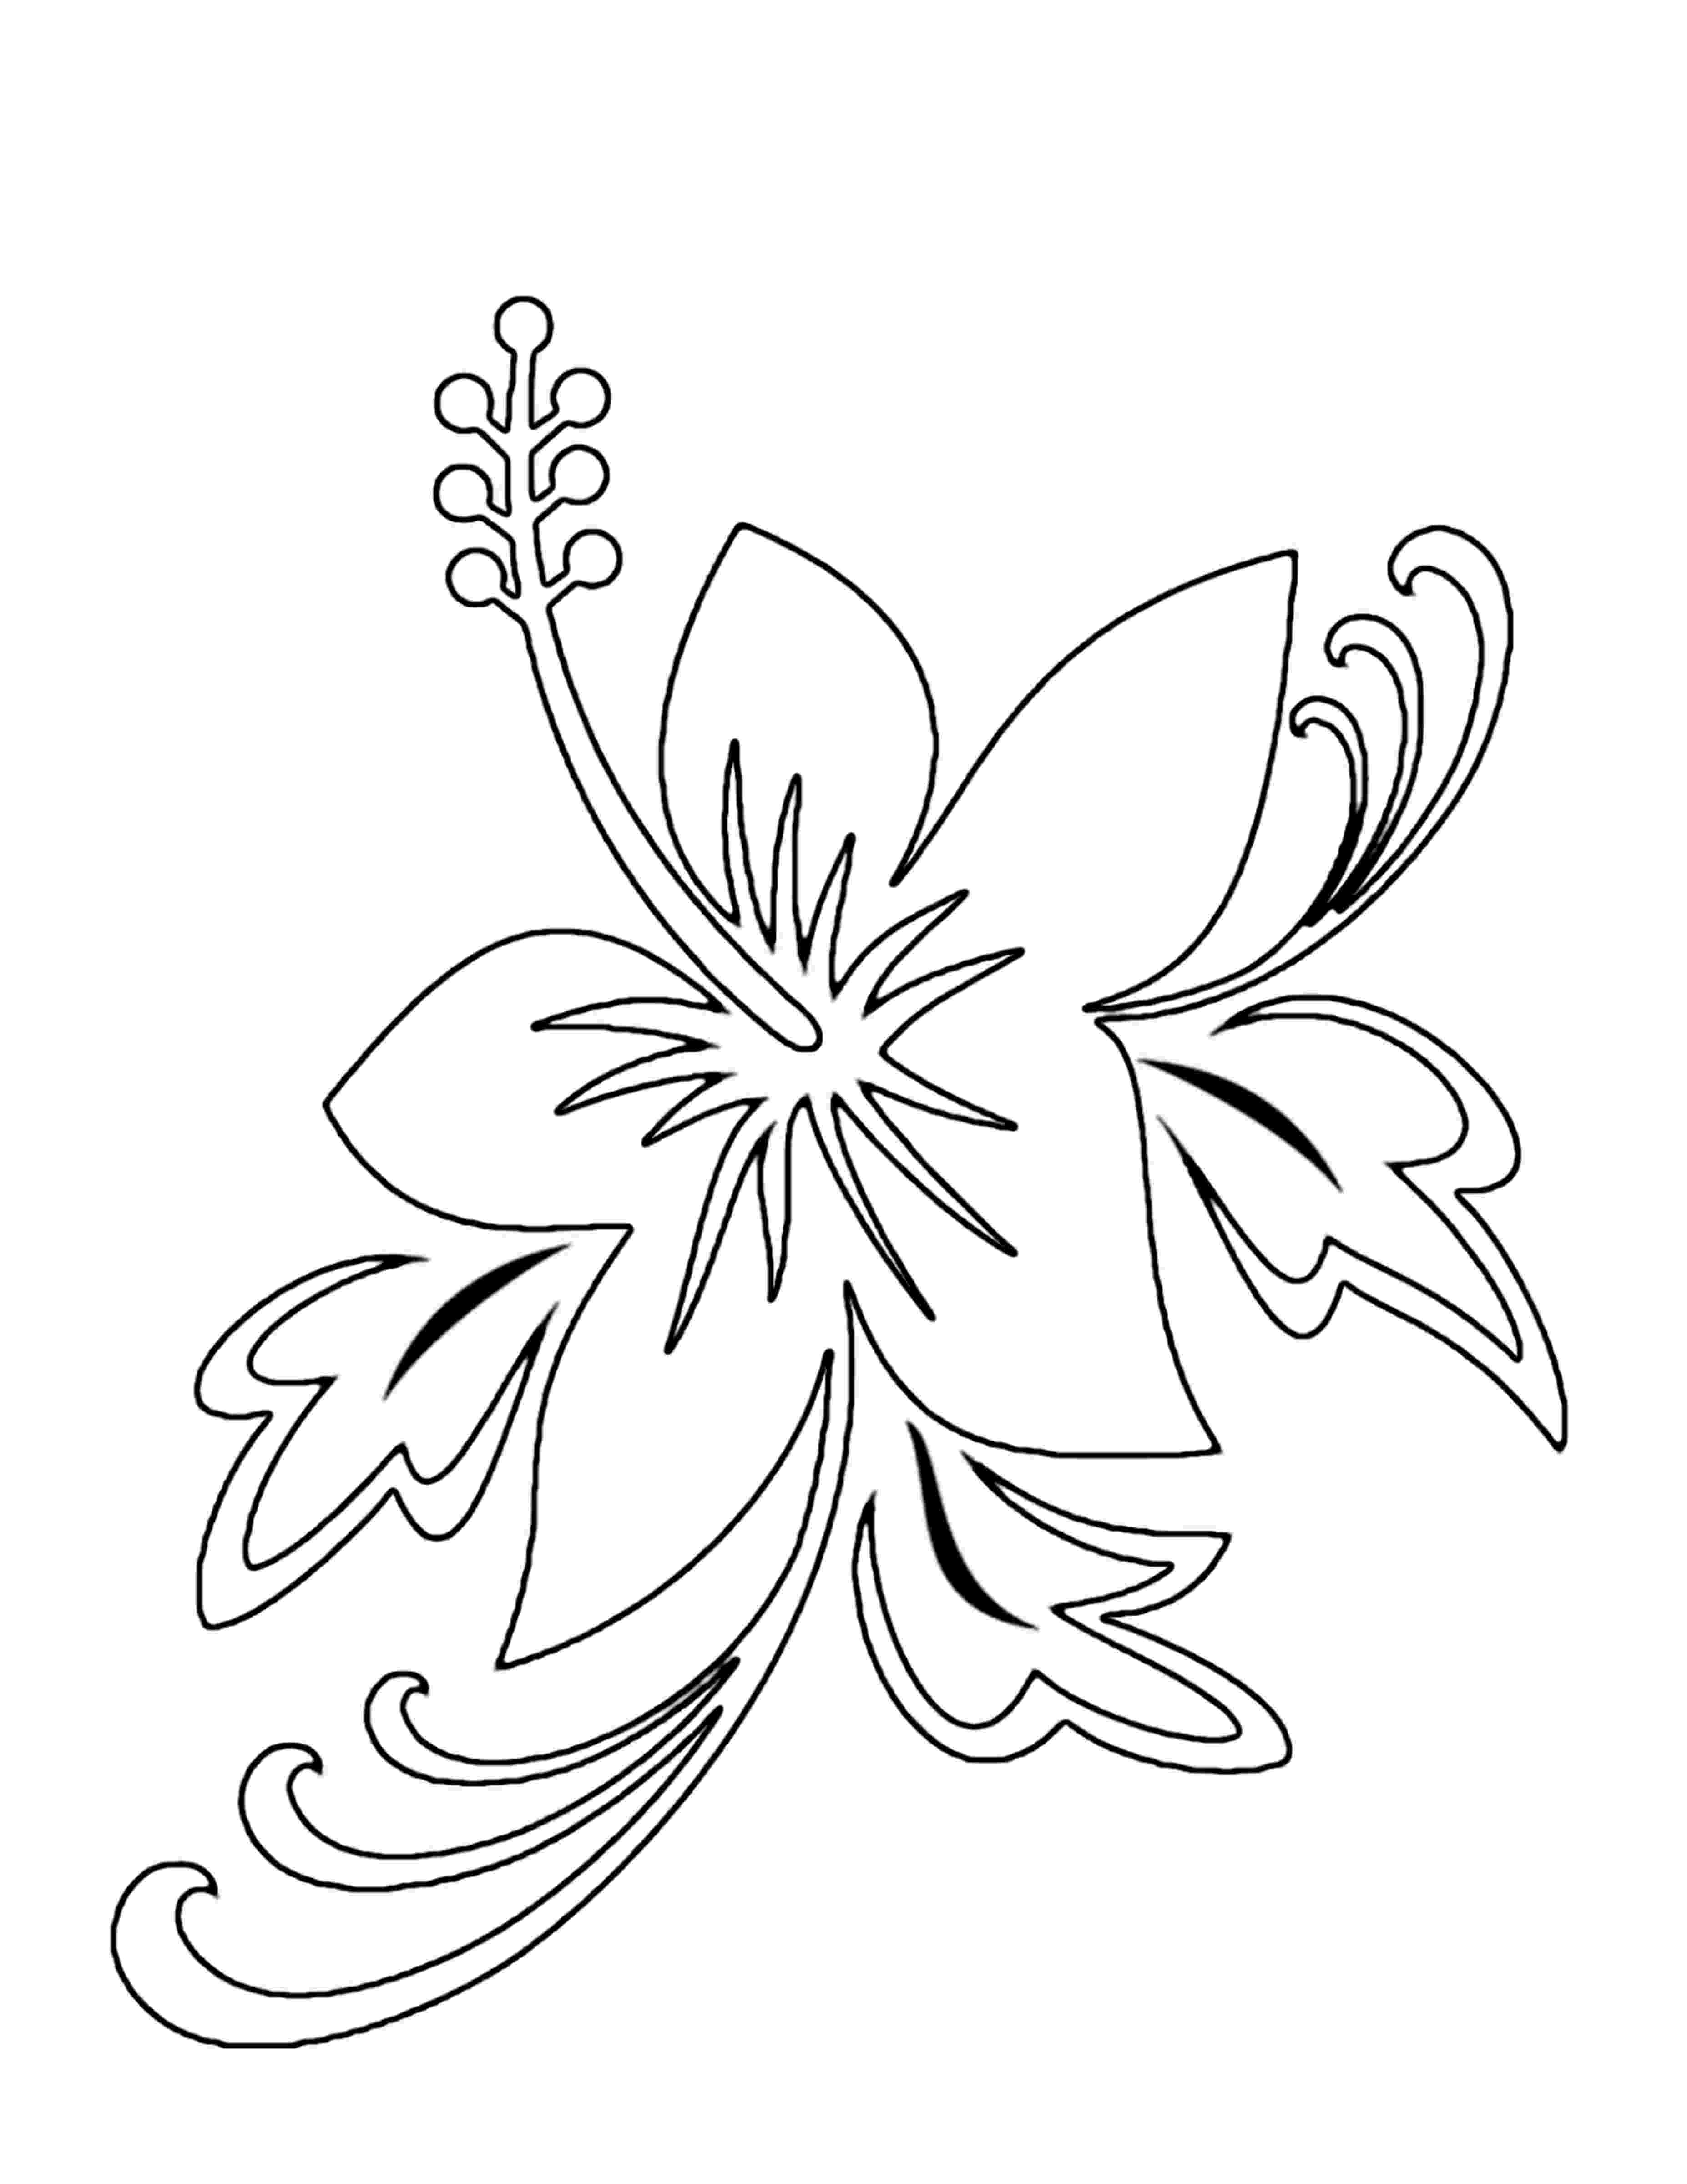 printable flower coloring pages free printable flower coloring pages for kids best flower pages printable coloring